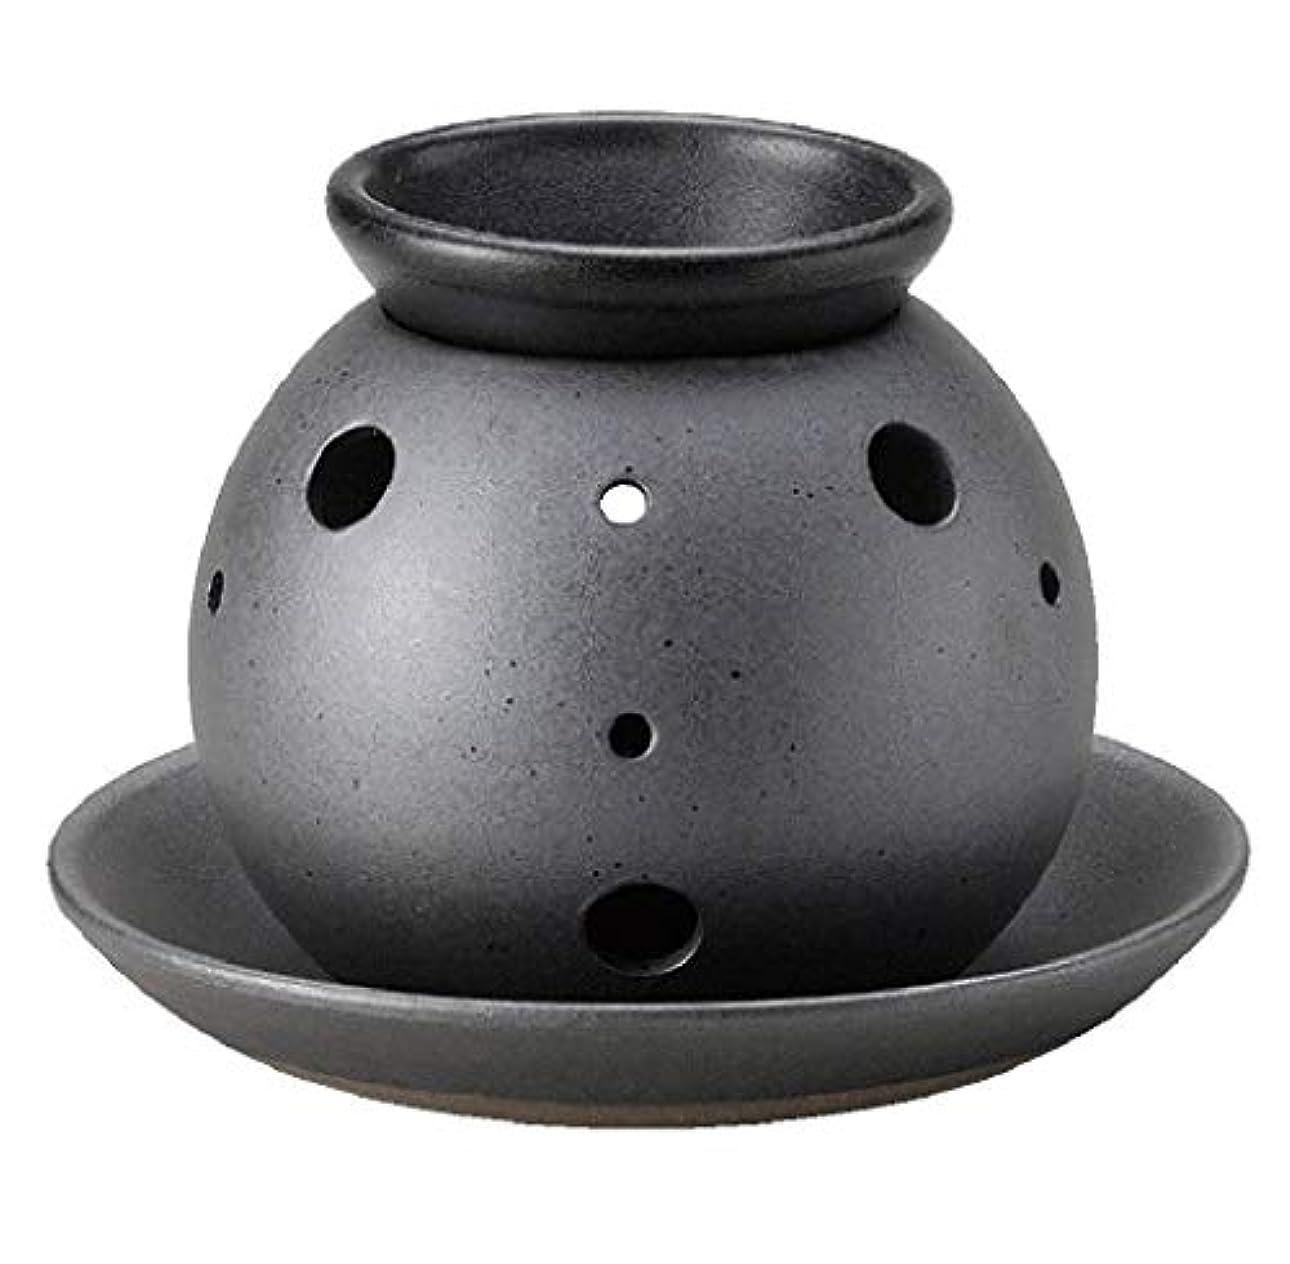 金額上陸シェトランド諸島常滑焼 7-227 盛正黒泥丸形茶香炉 盛正φ14.5×H11㎝